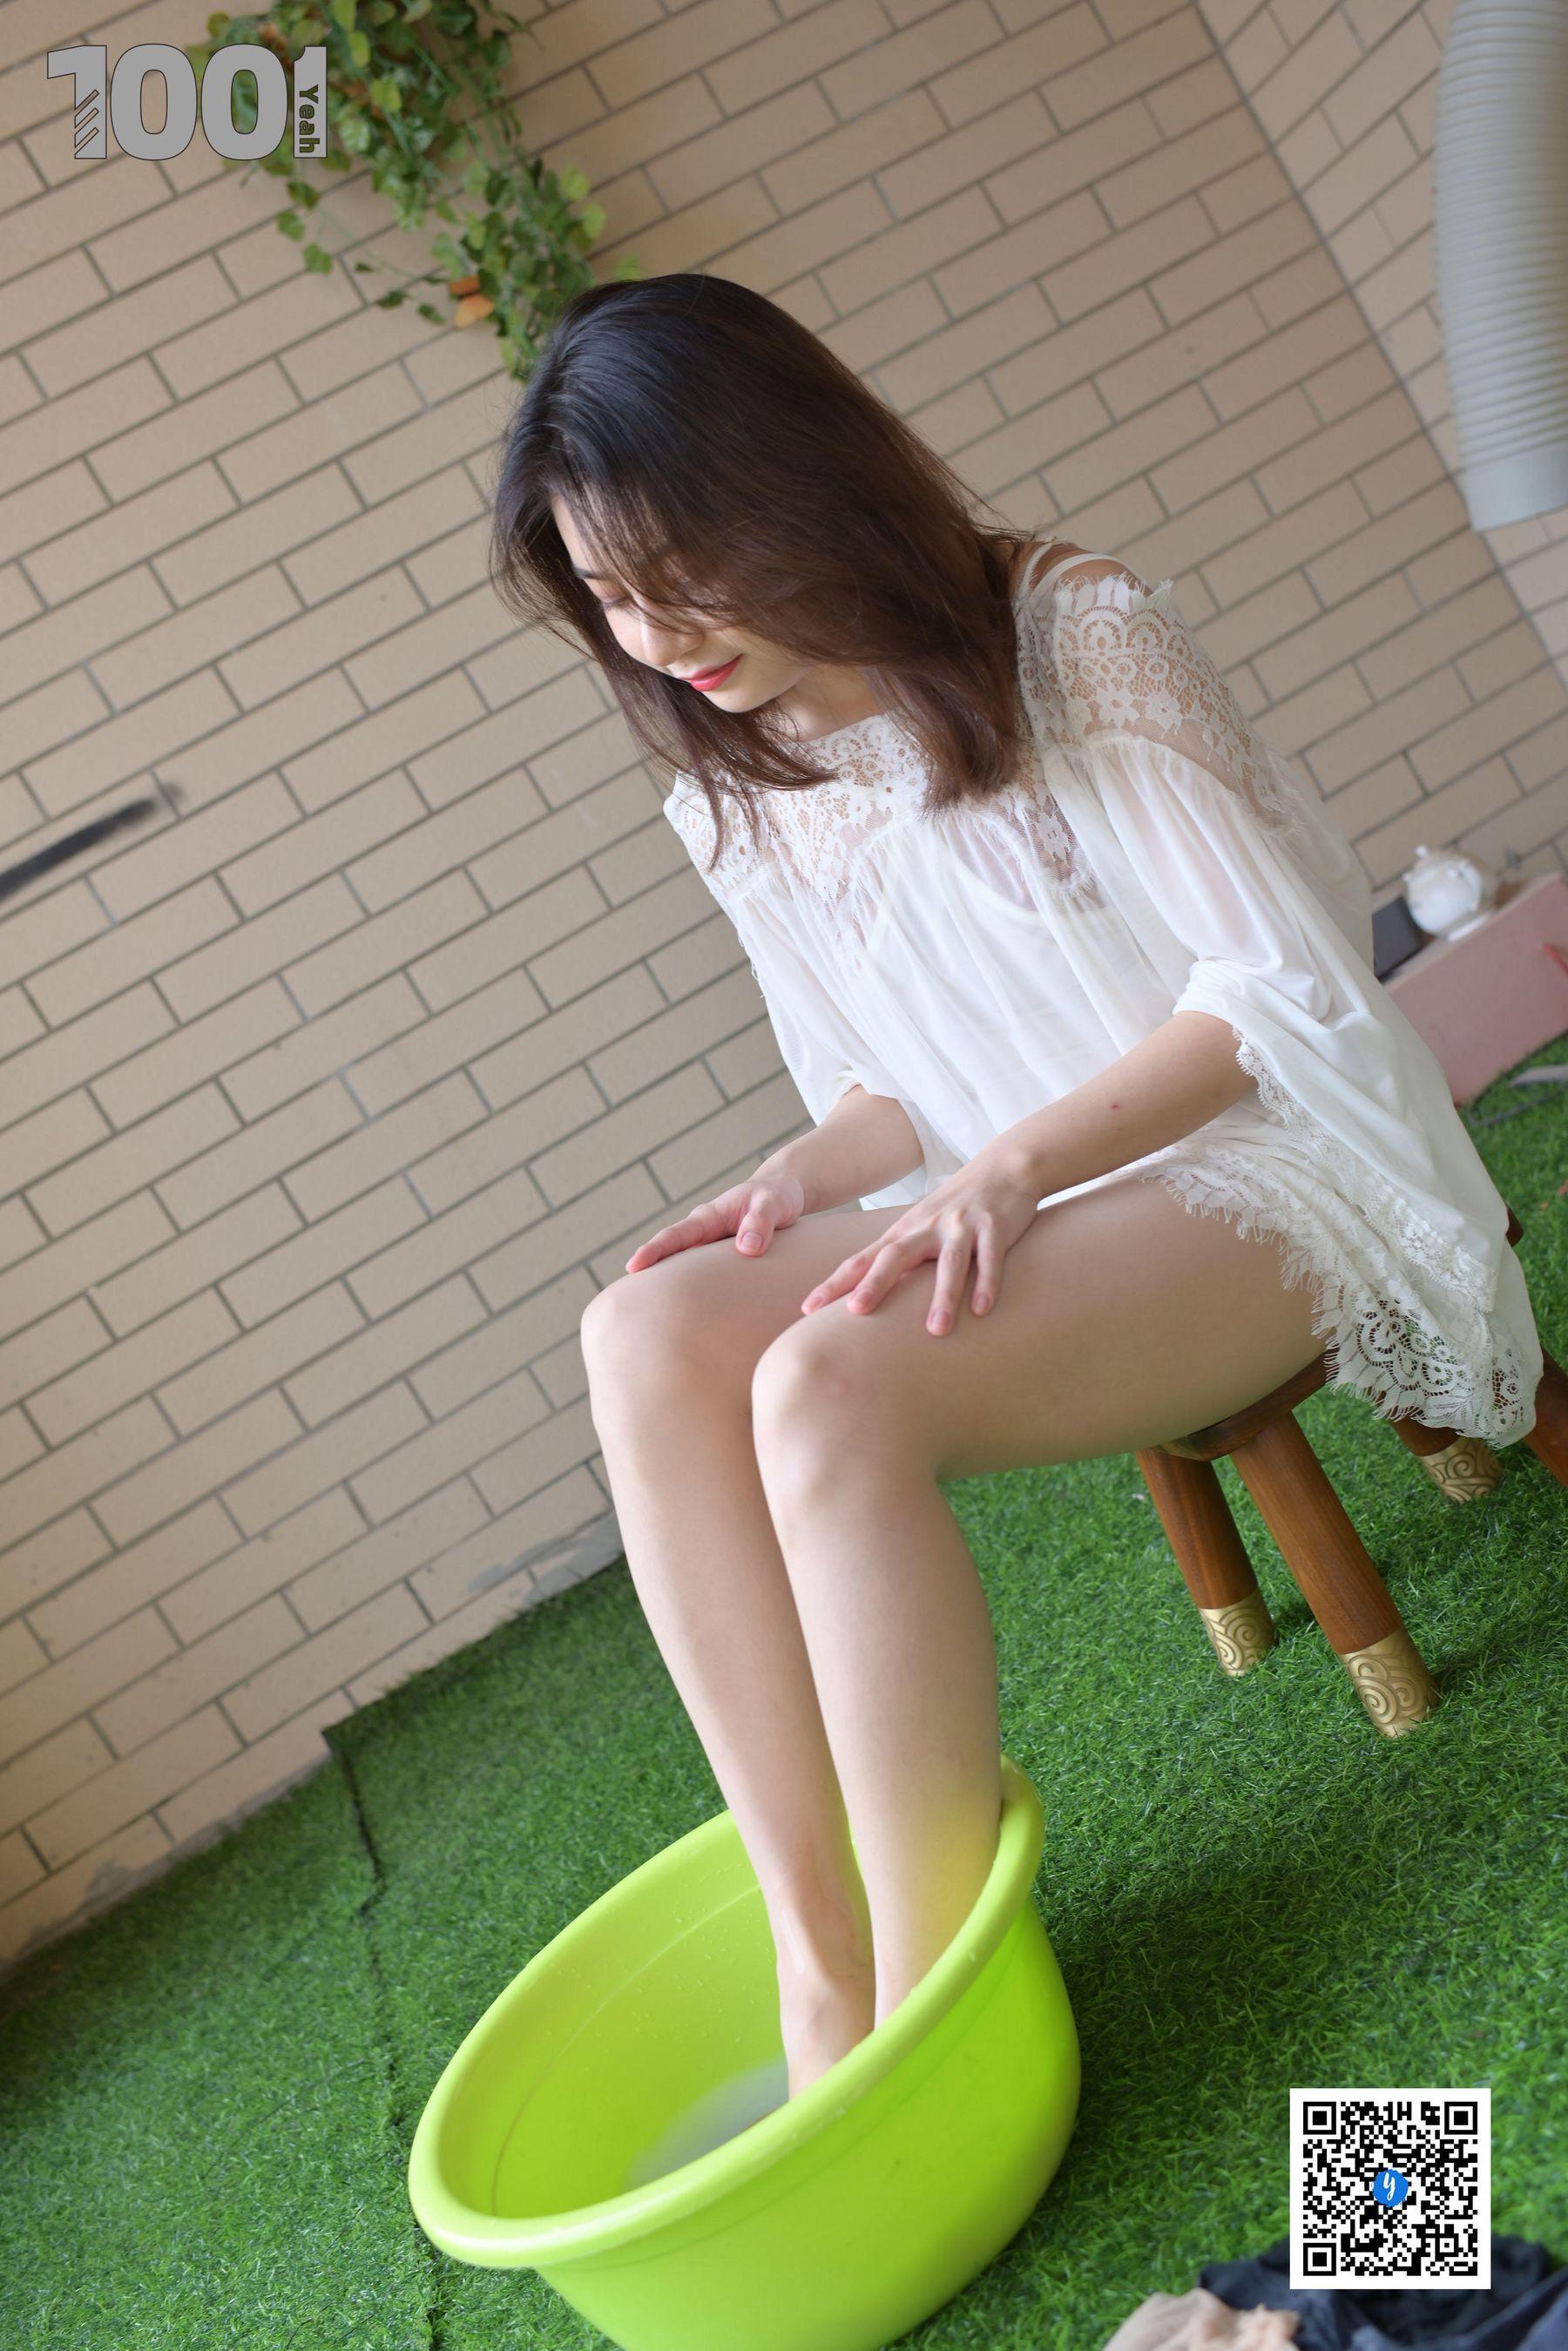 [IESS] NO.182 真真【洗丝5】  丝袜美腿写真[60P]插图(4)